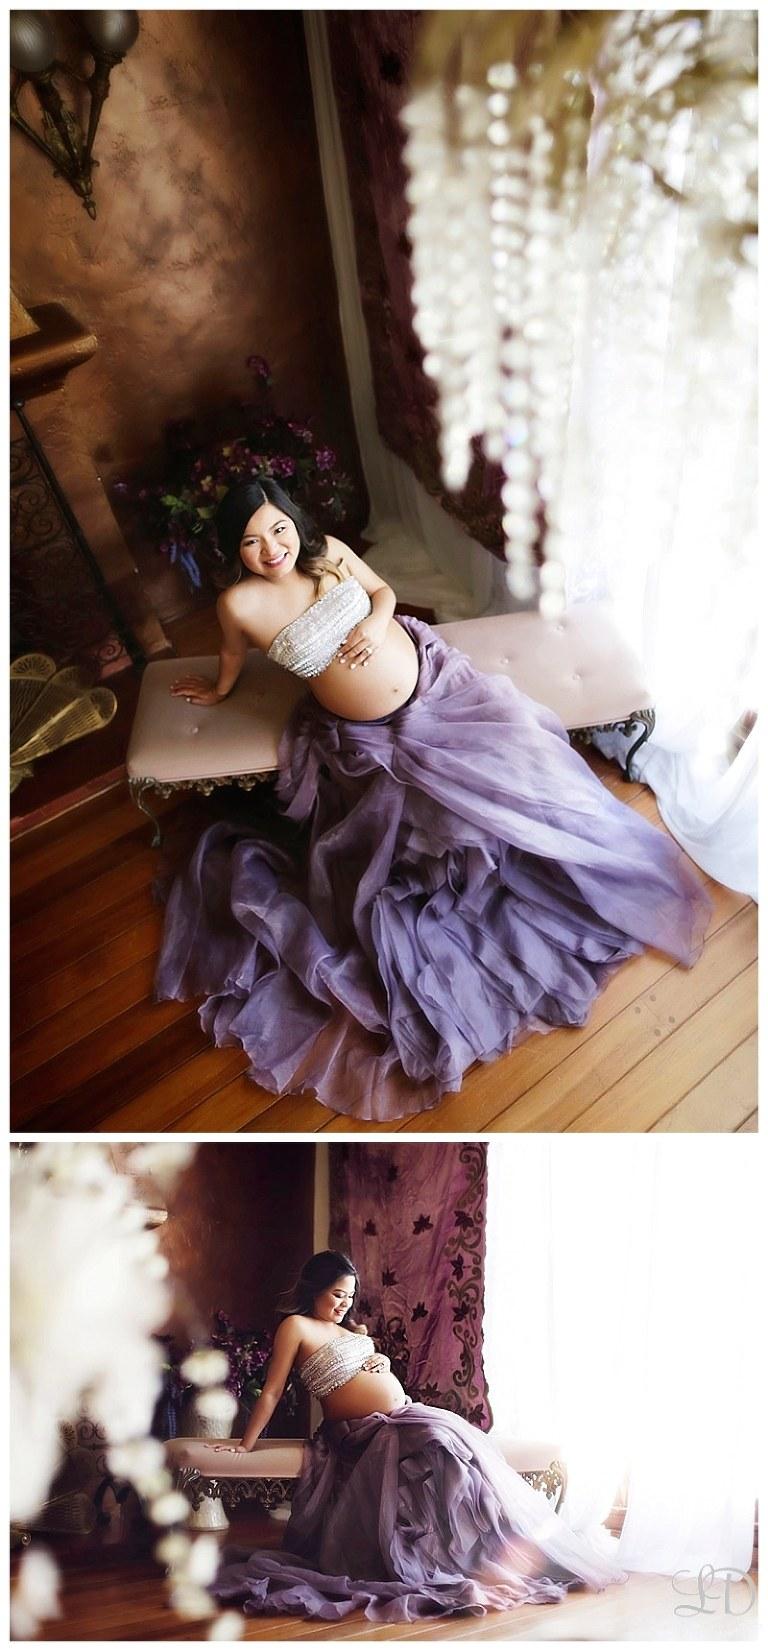 beautiful maternity photoshoot-maternity photographer-professional photographer-lori dorman photography_1267.jpg